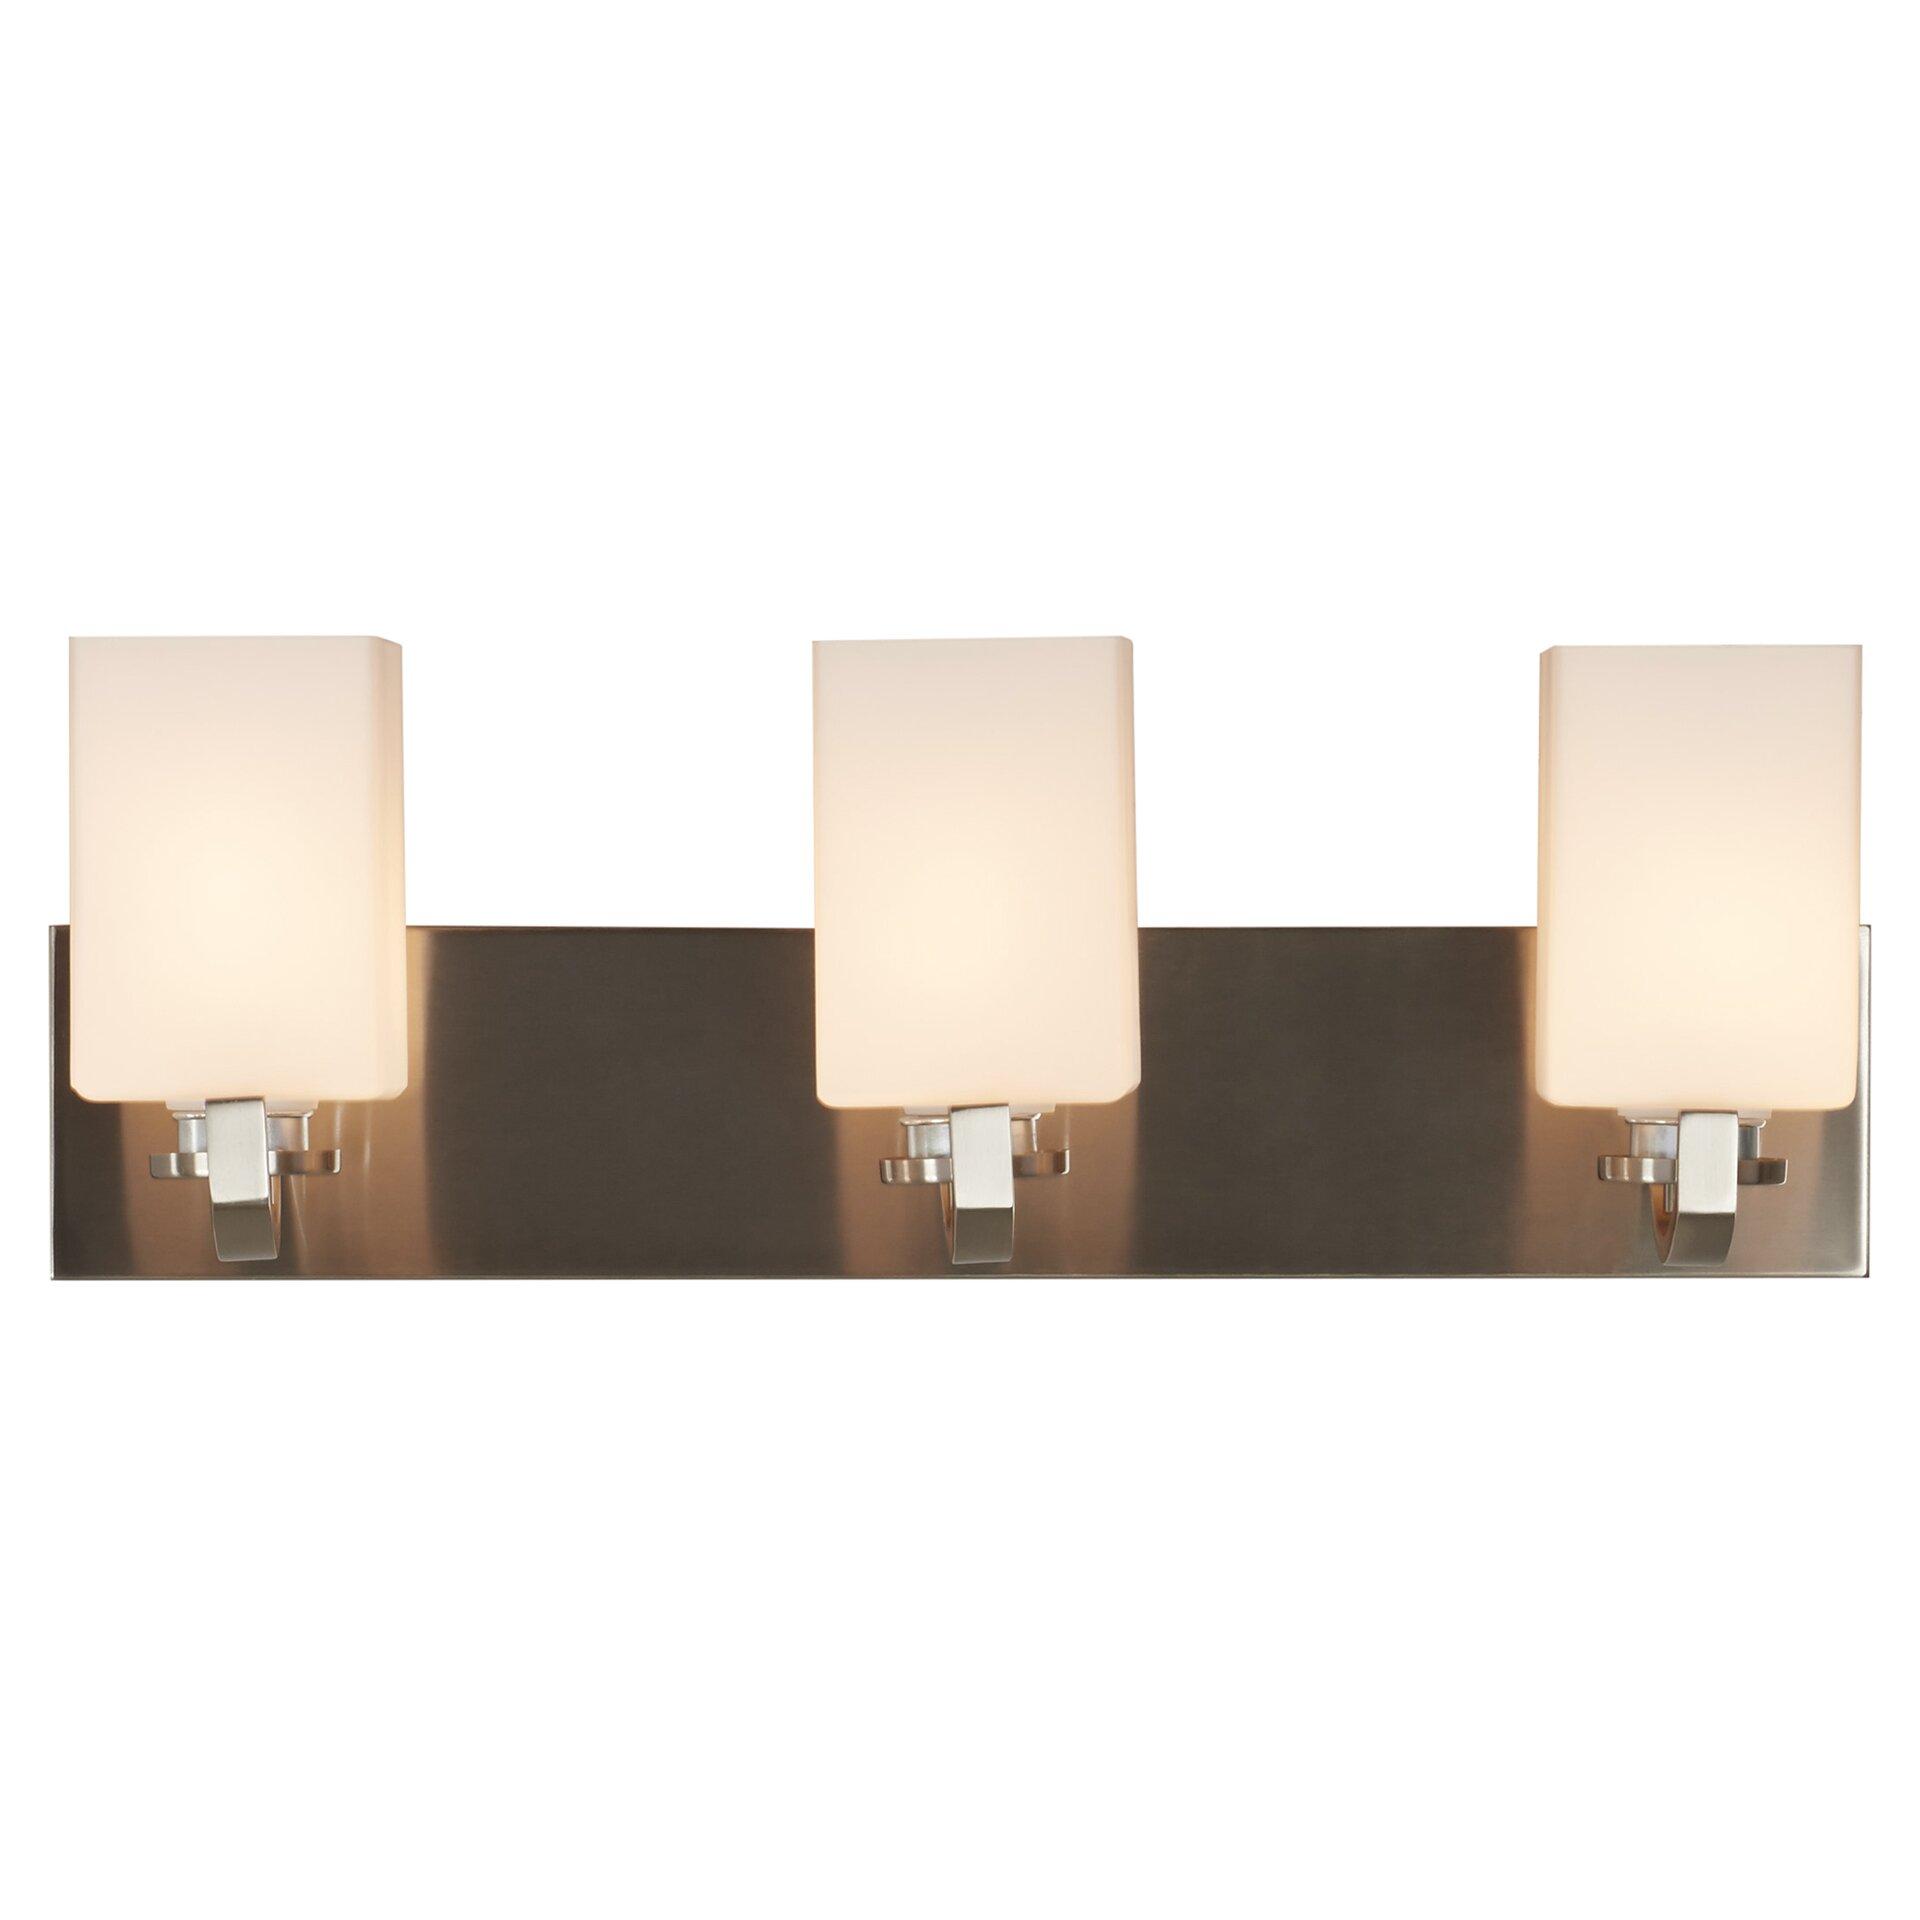 Brayden Studio Soho 3 Light Vanity Light & Reviews Wayfair